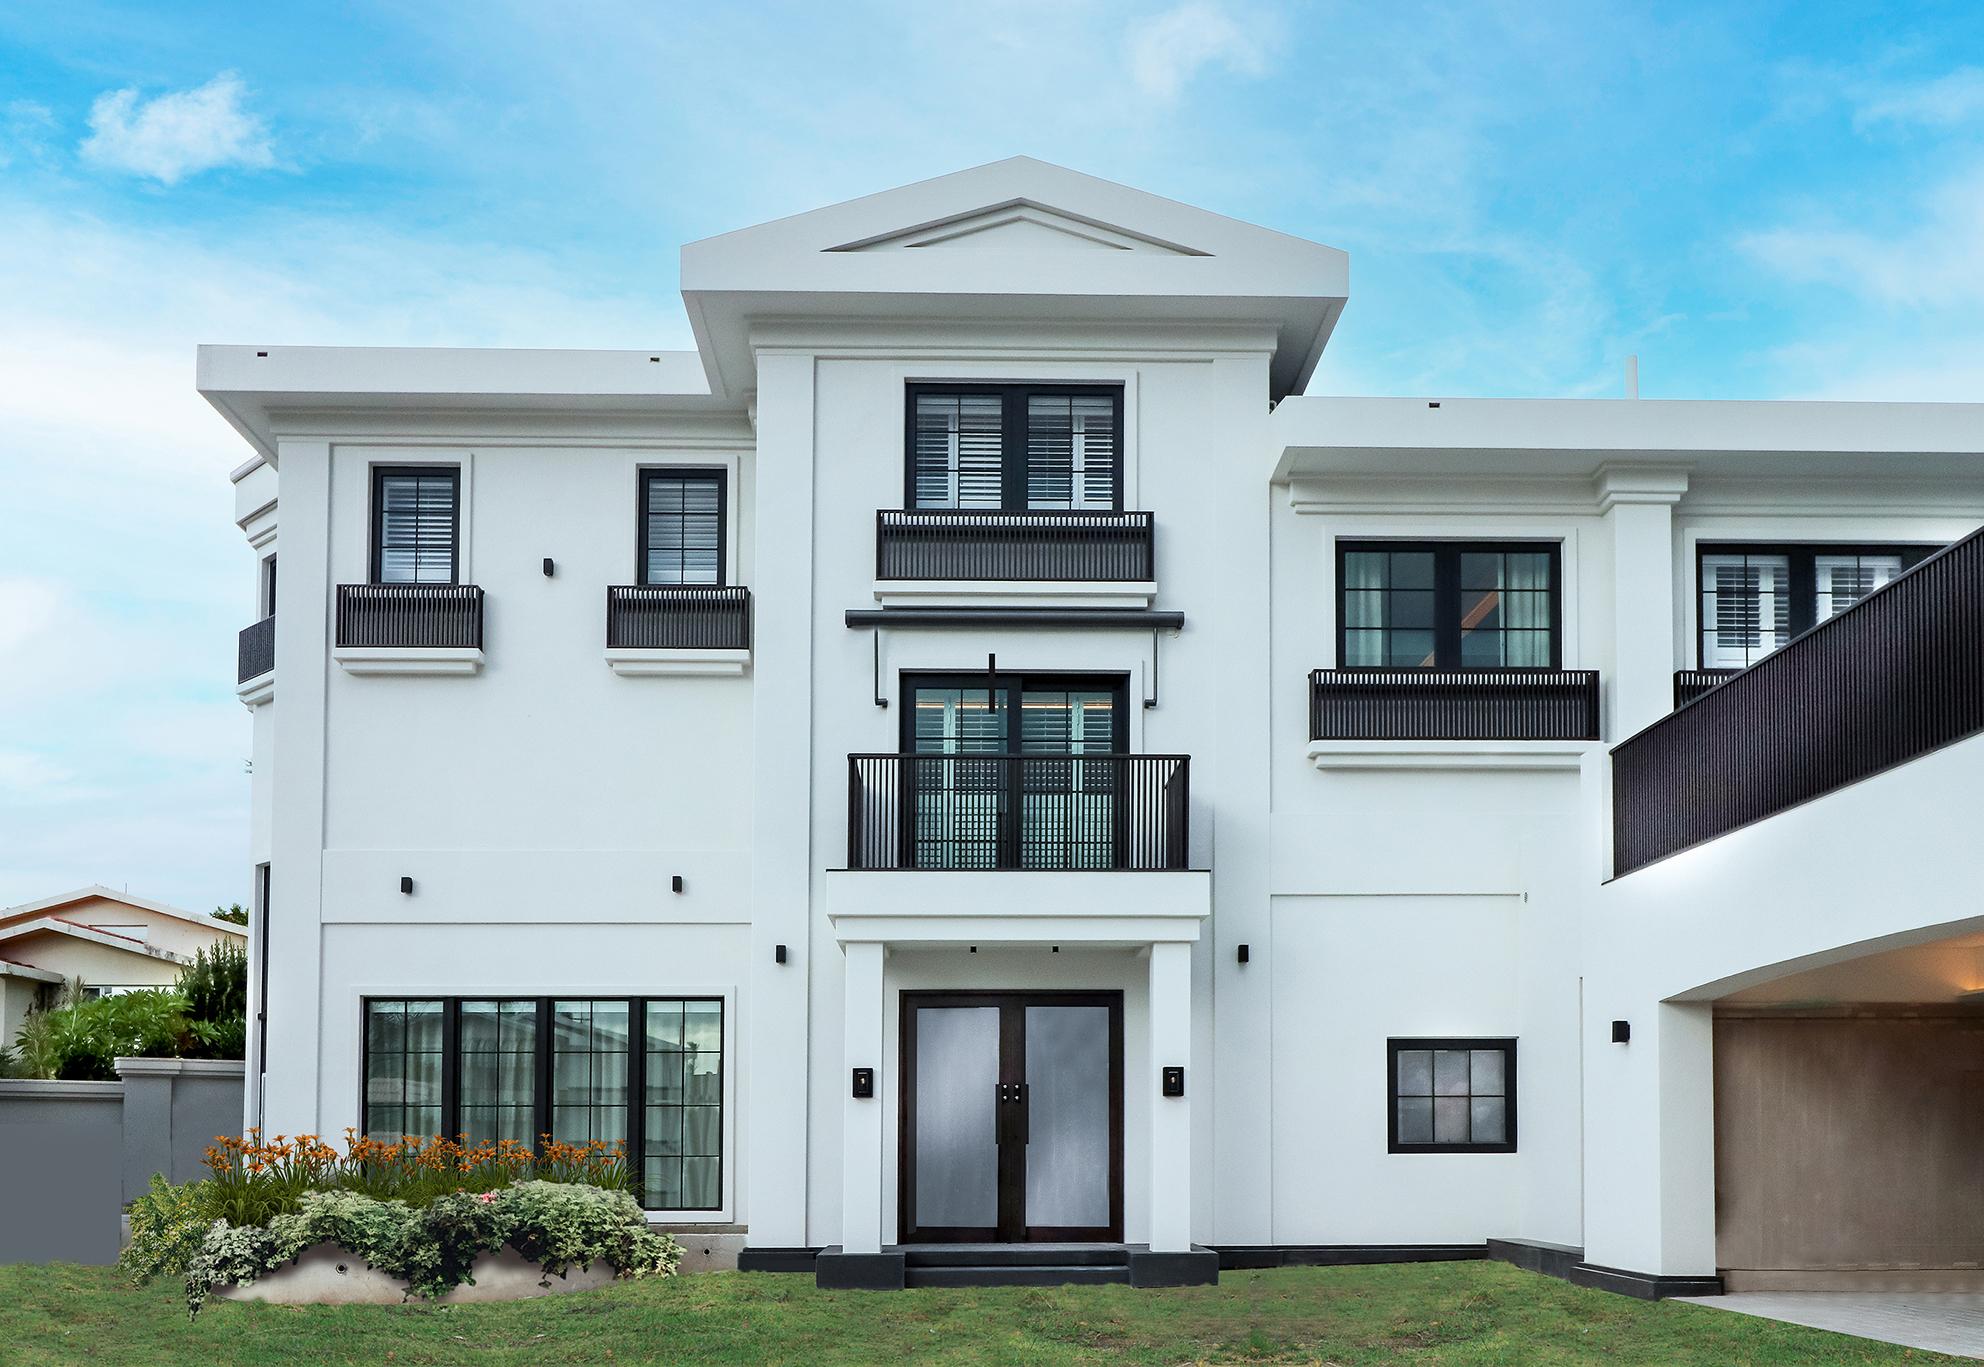 怡星鋁窗-Aliplast-歐洲高級鋁窗玻璃趟門款式-European-Premium-Window-Window-and-sliding-door-solution (3)